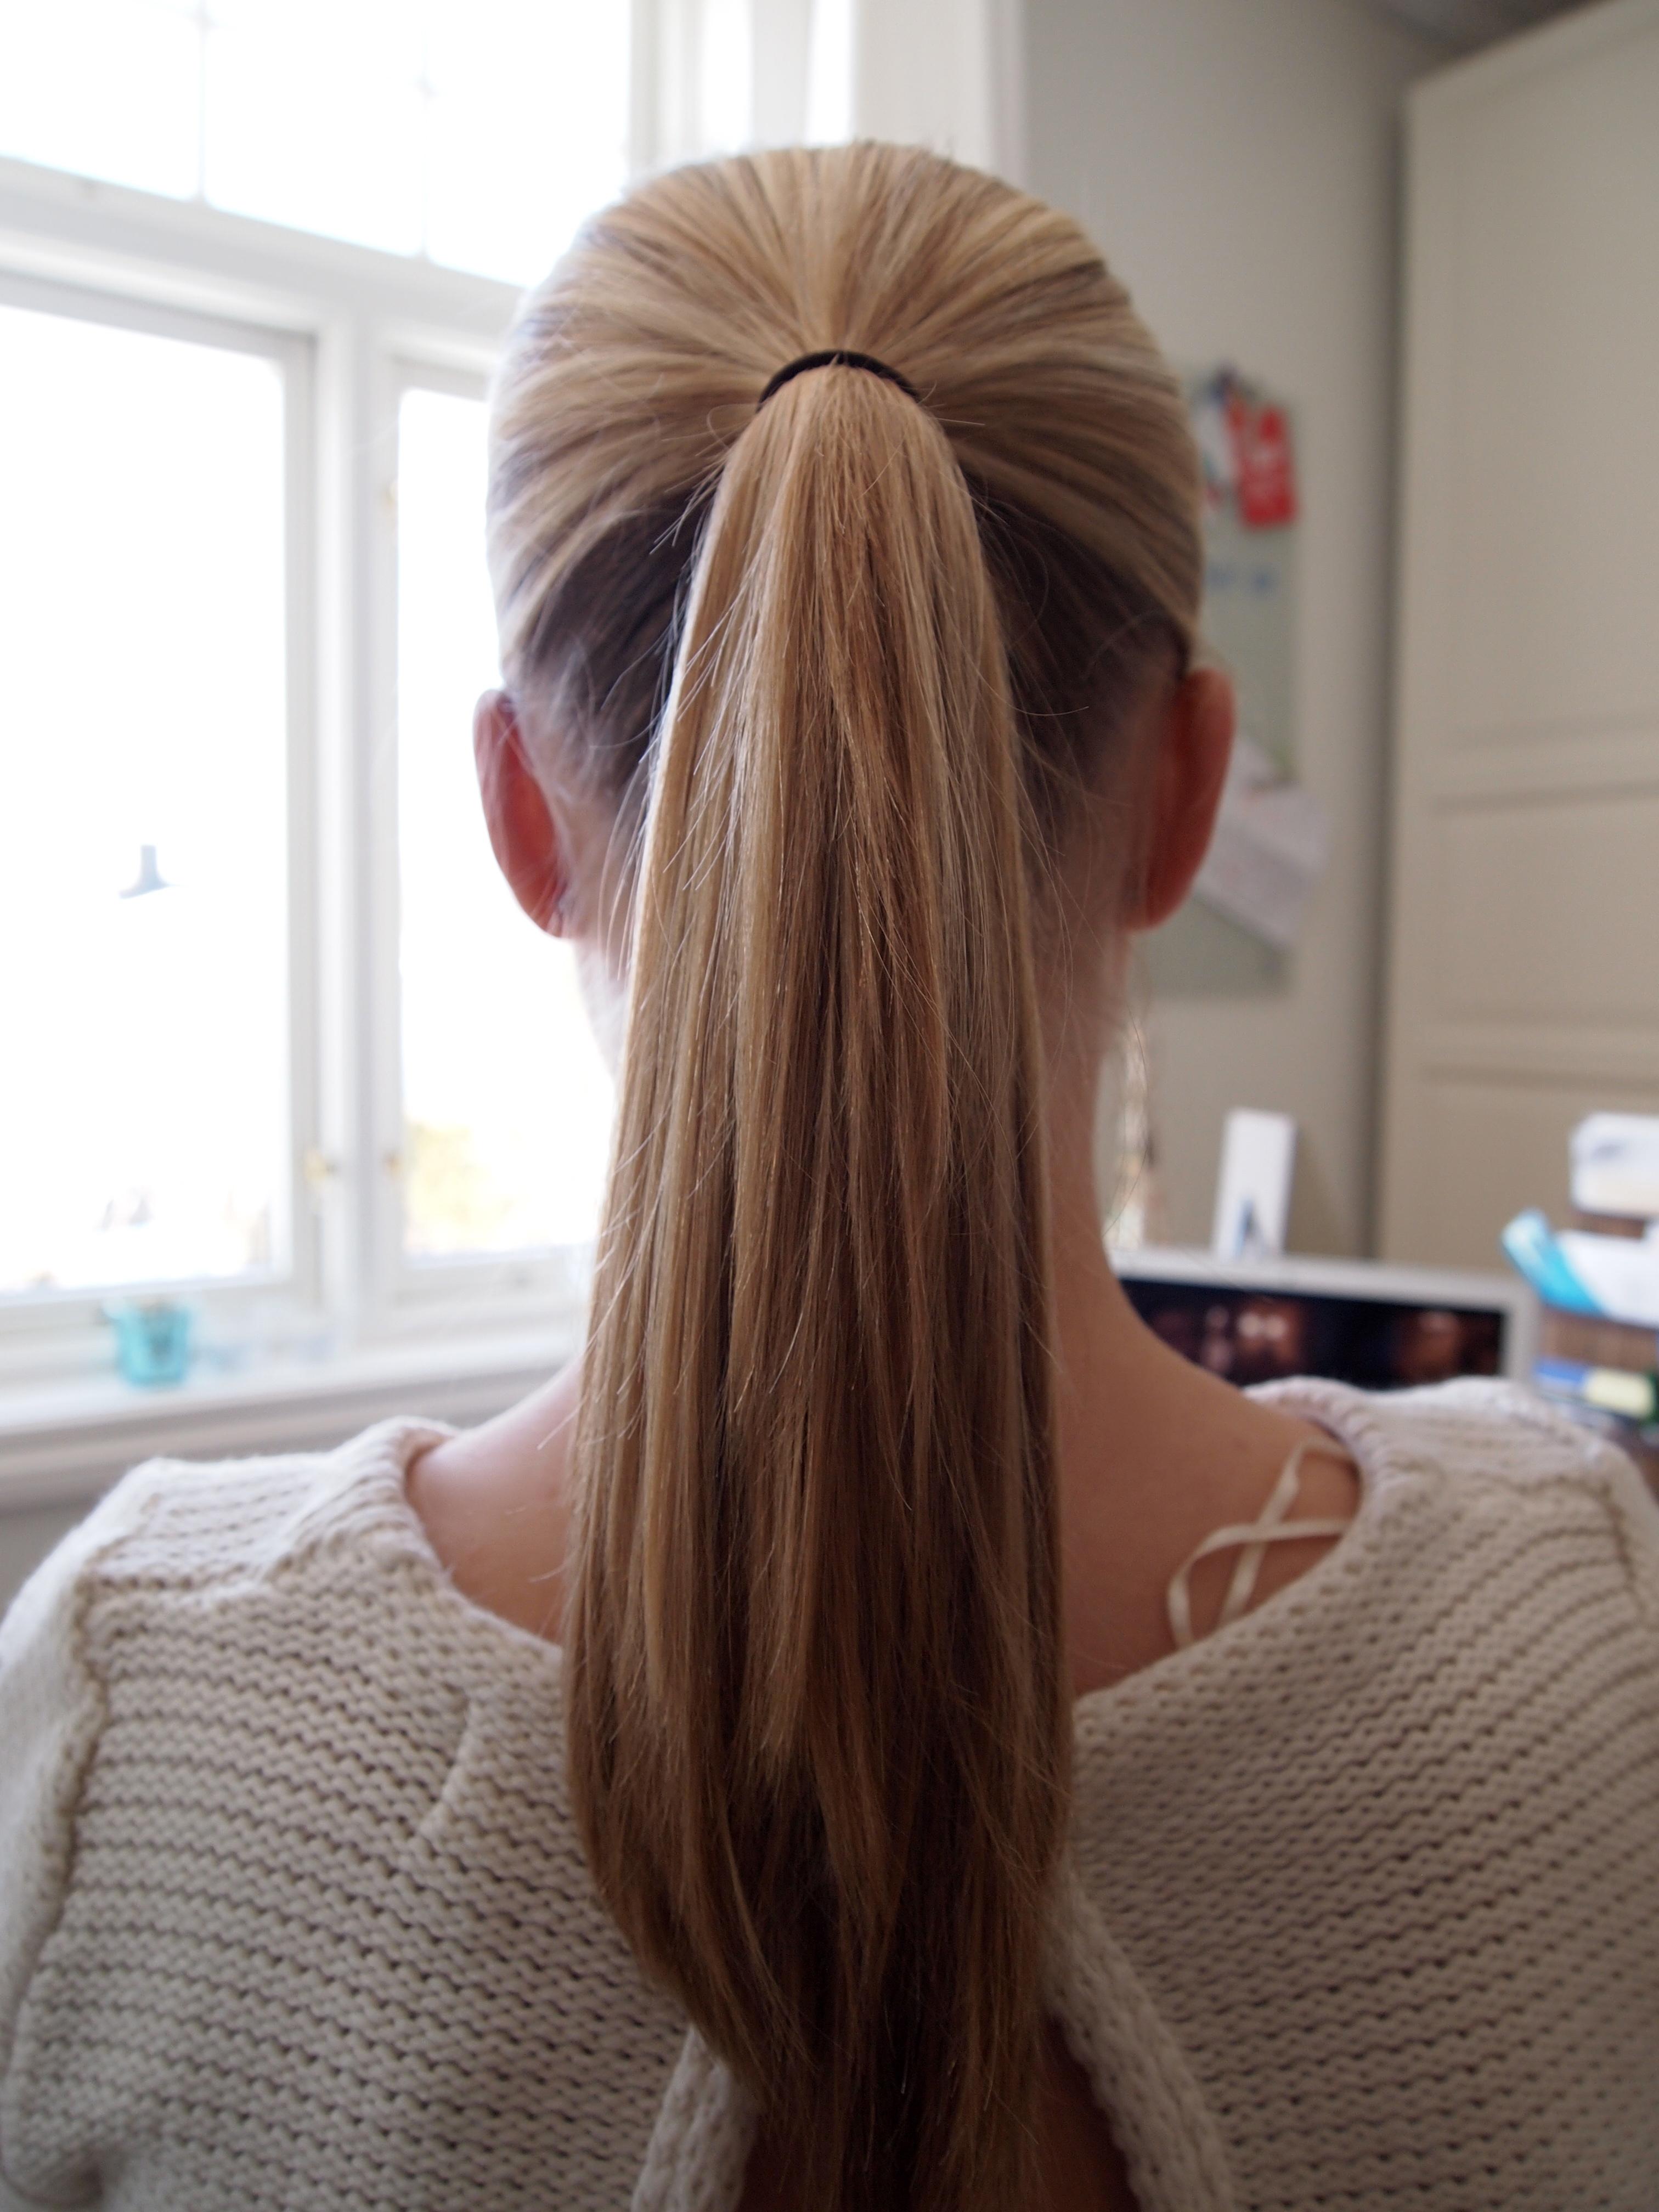 How To Make A Classical Ballet Bun Medium To Long Hair The